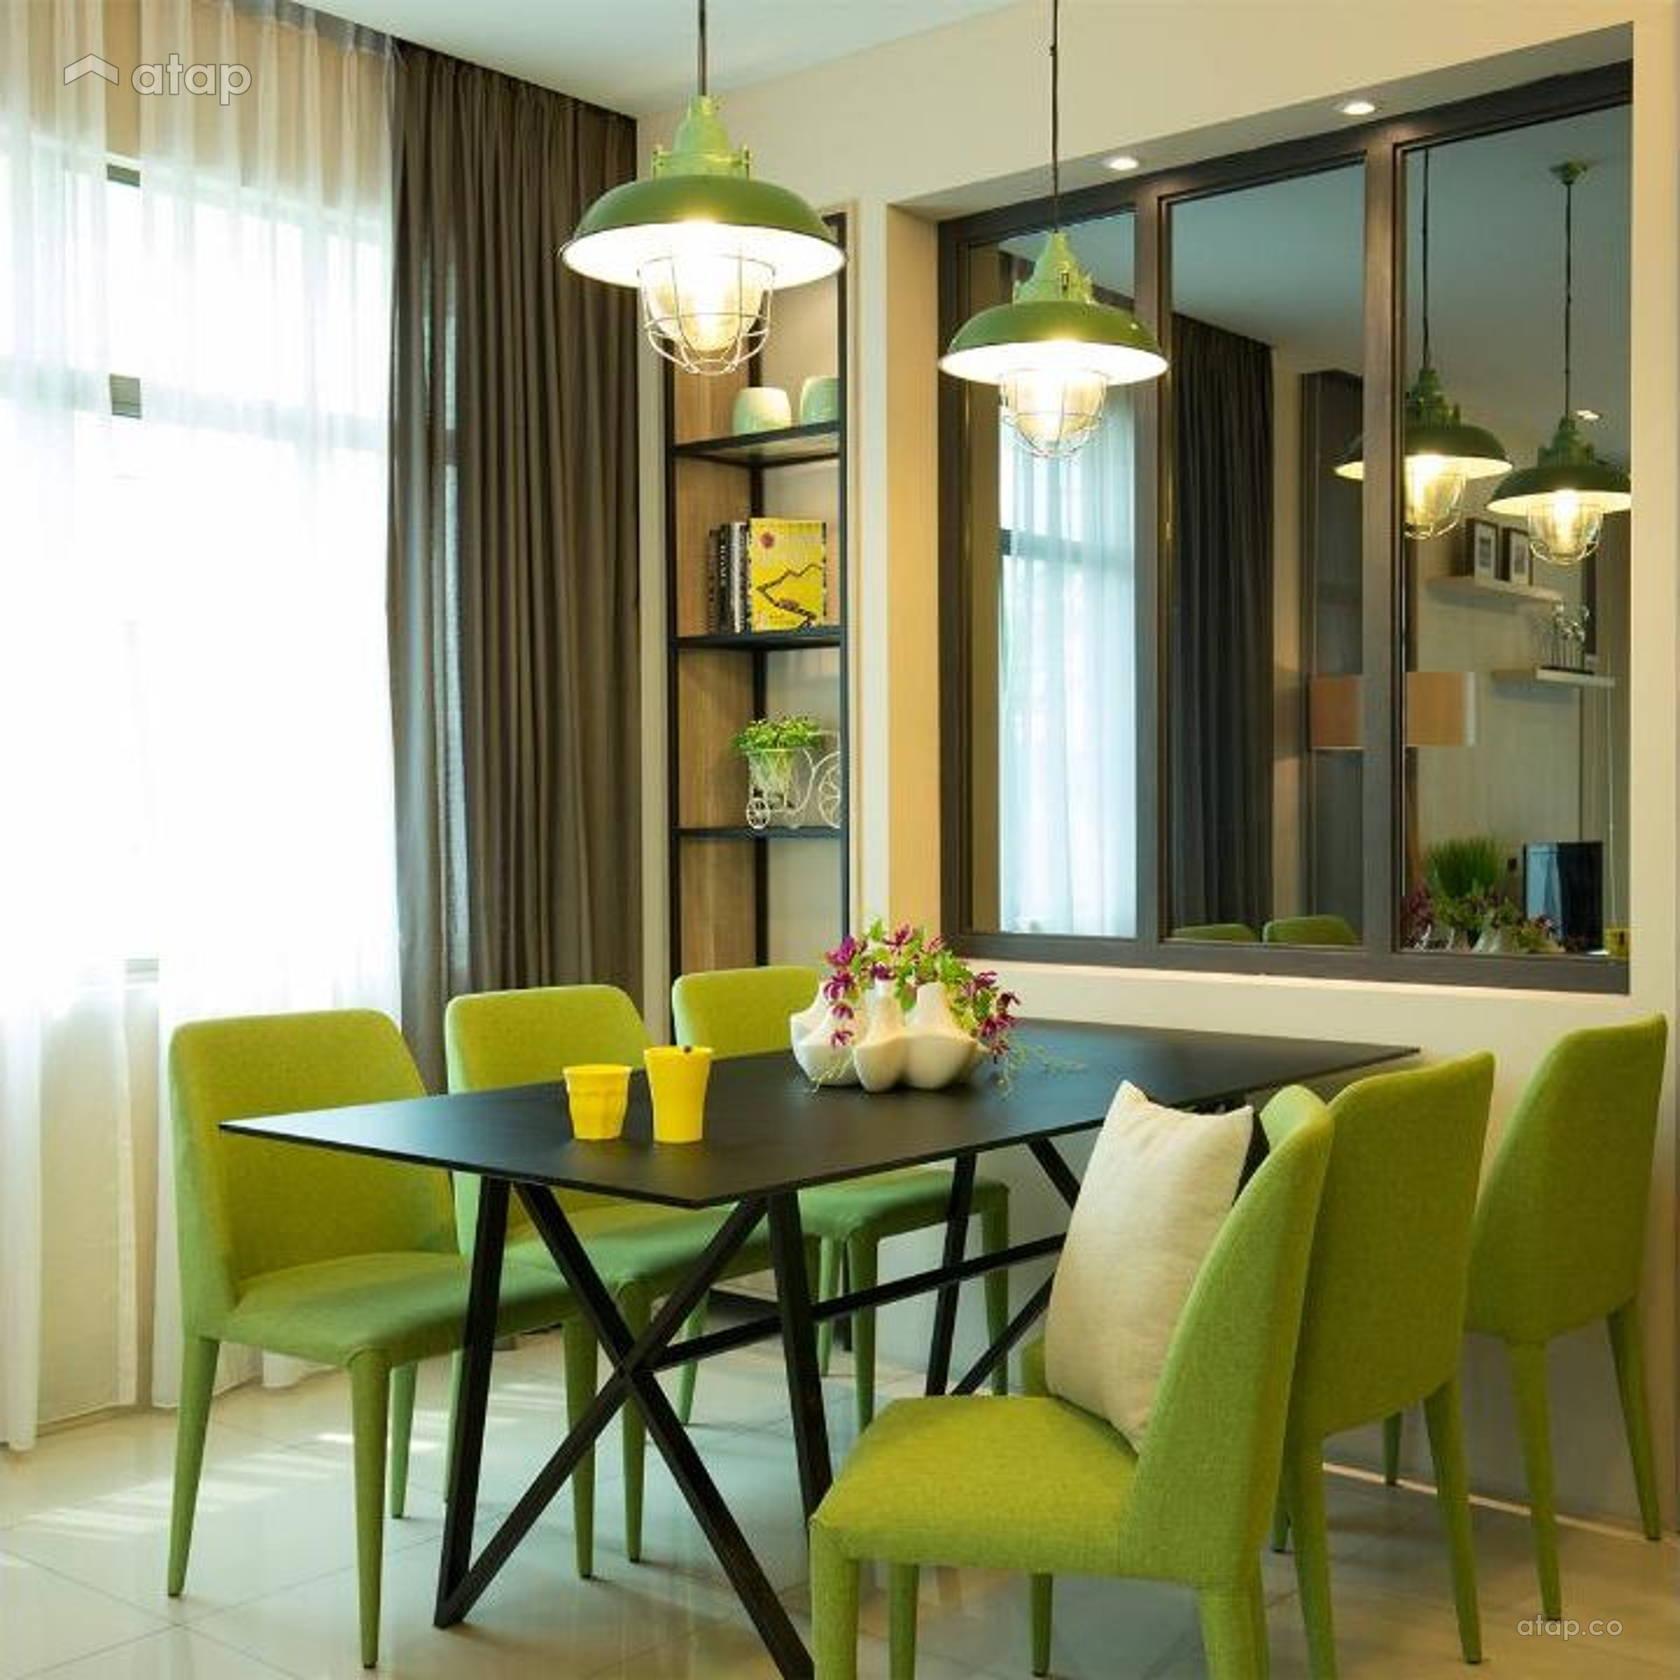 Show House Interior Design Malaysia House Decor - Show houses interior design